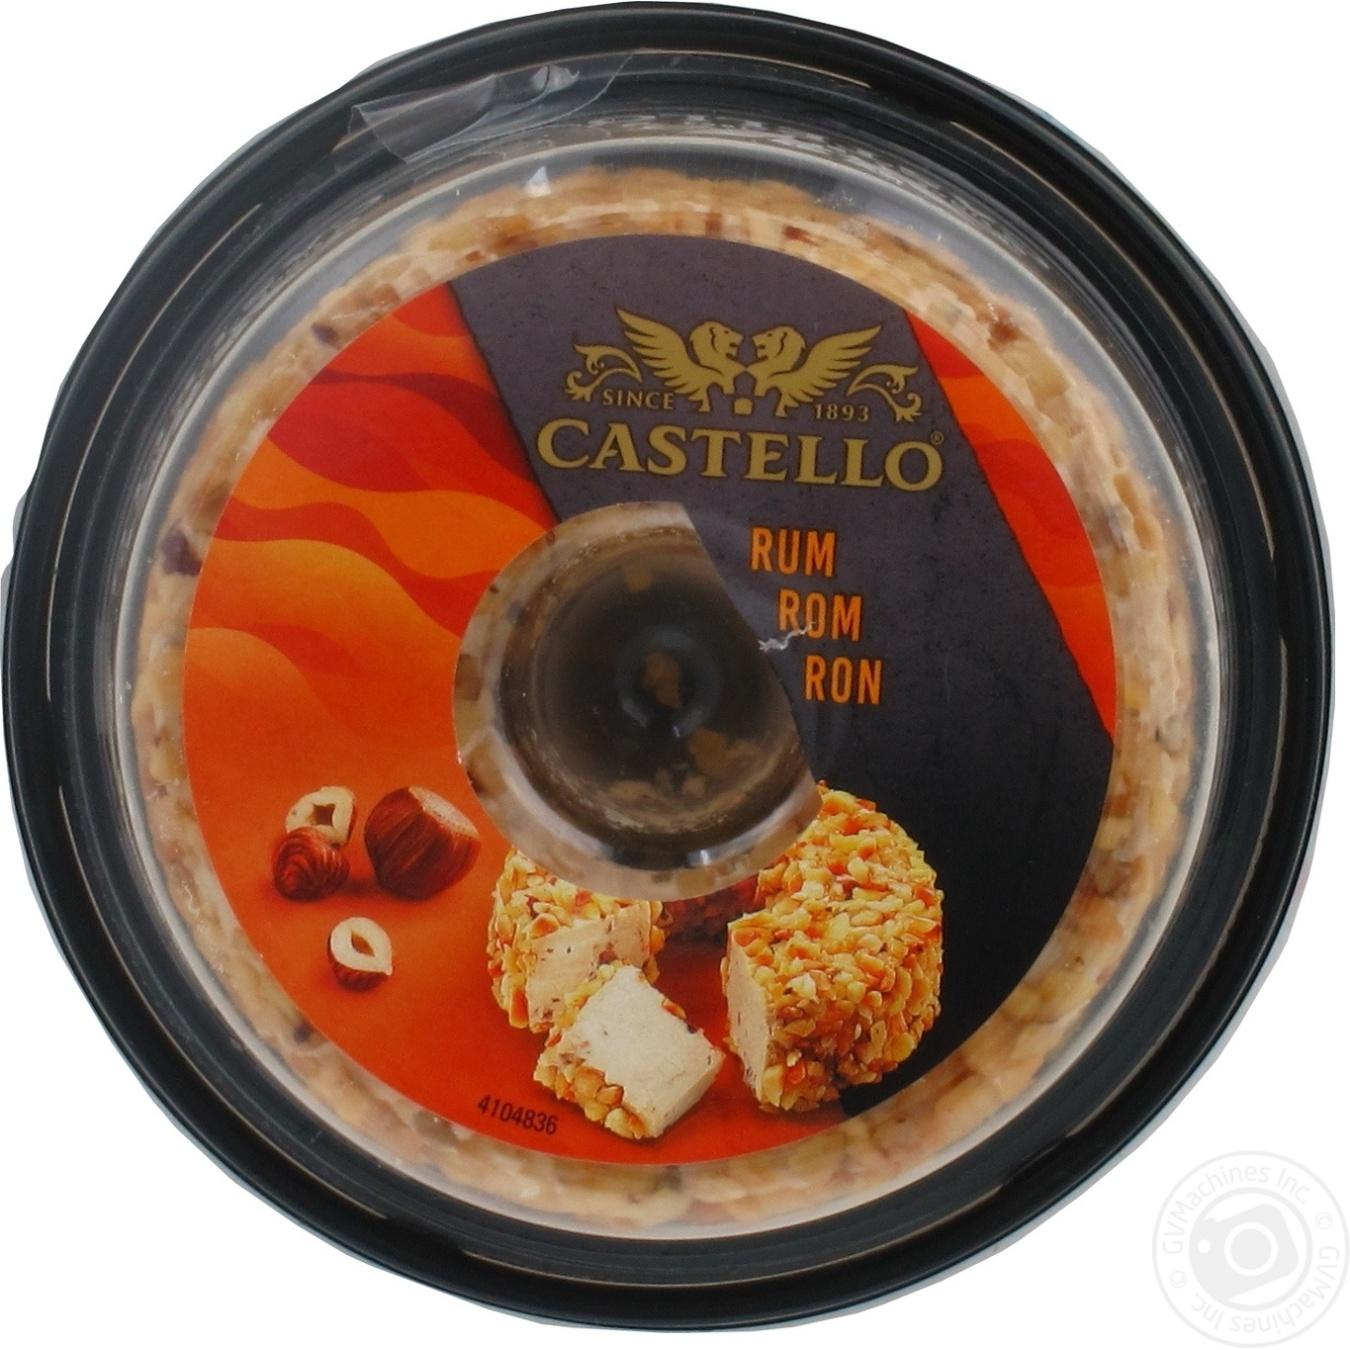 Крем-сир з ромом та горіхами Castello 125г → Молочное и яйца → Сыр ... 90fc4005c95